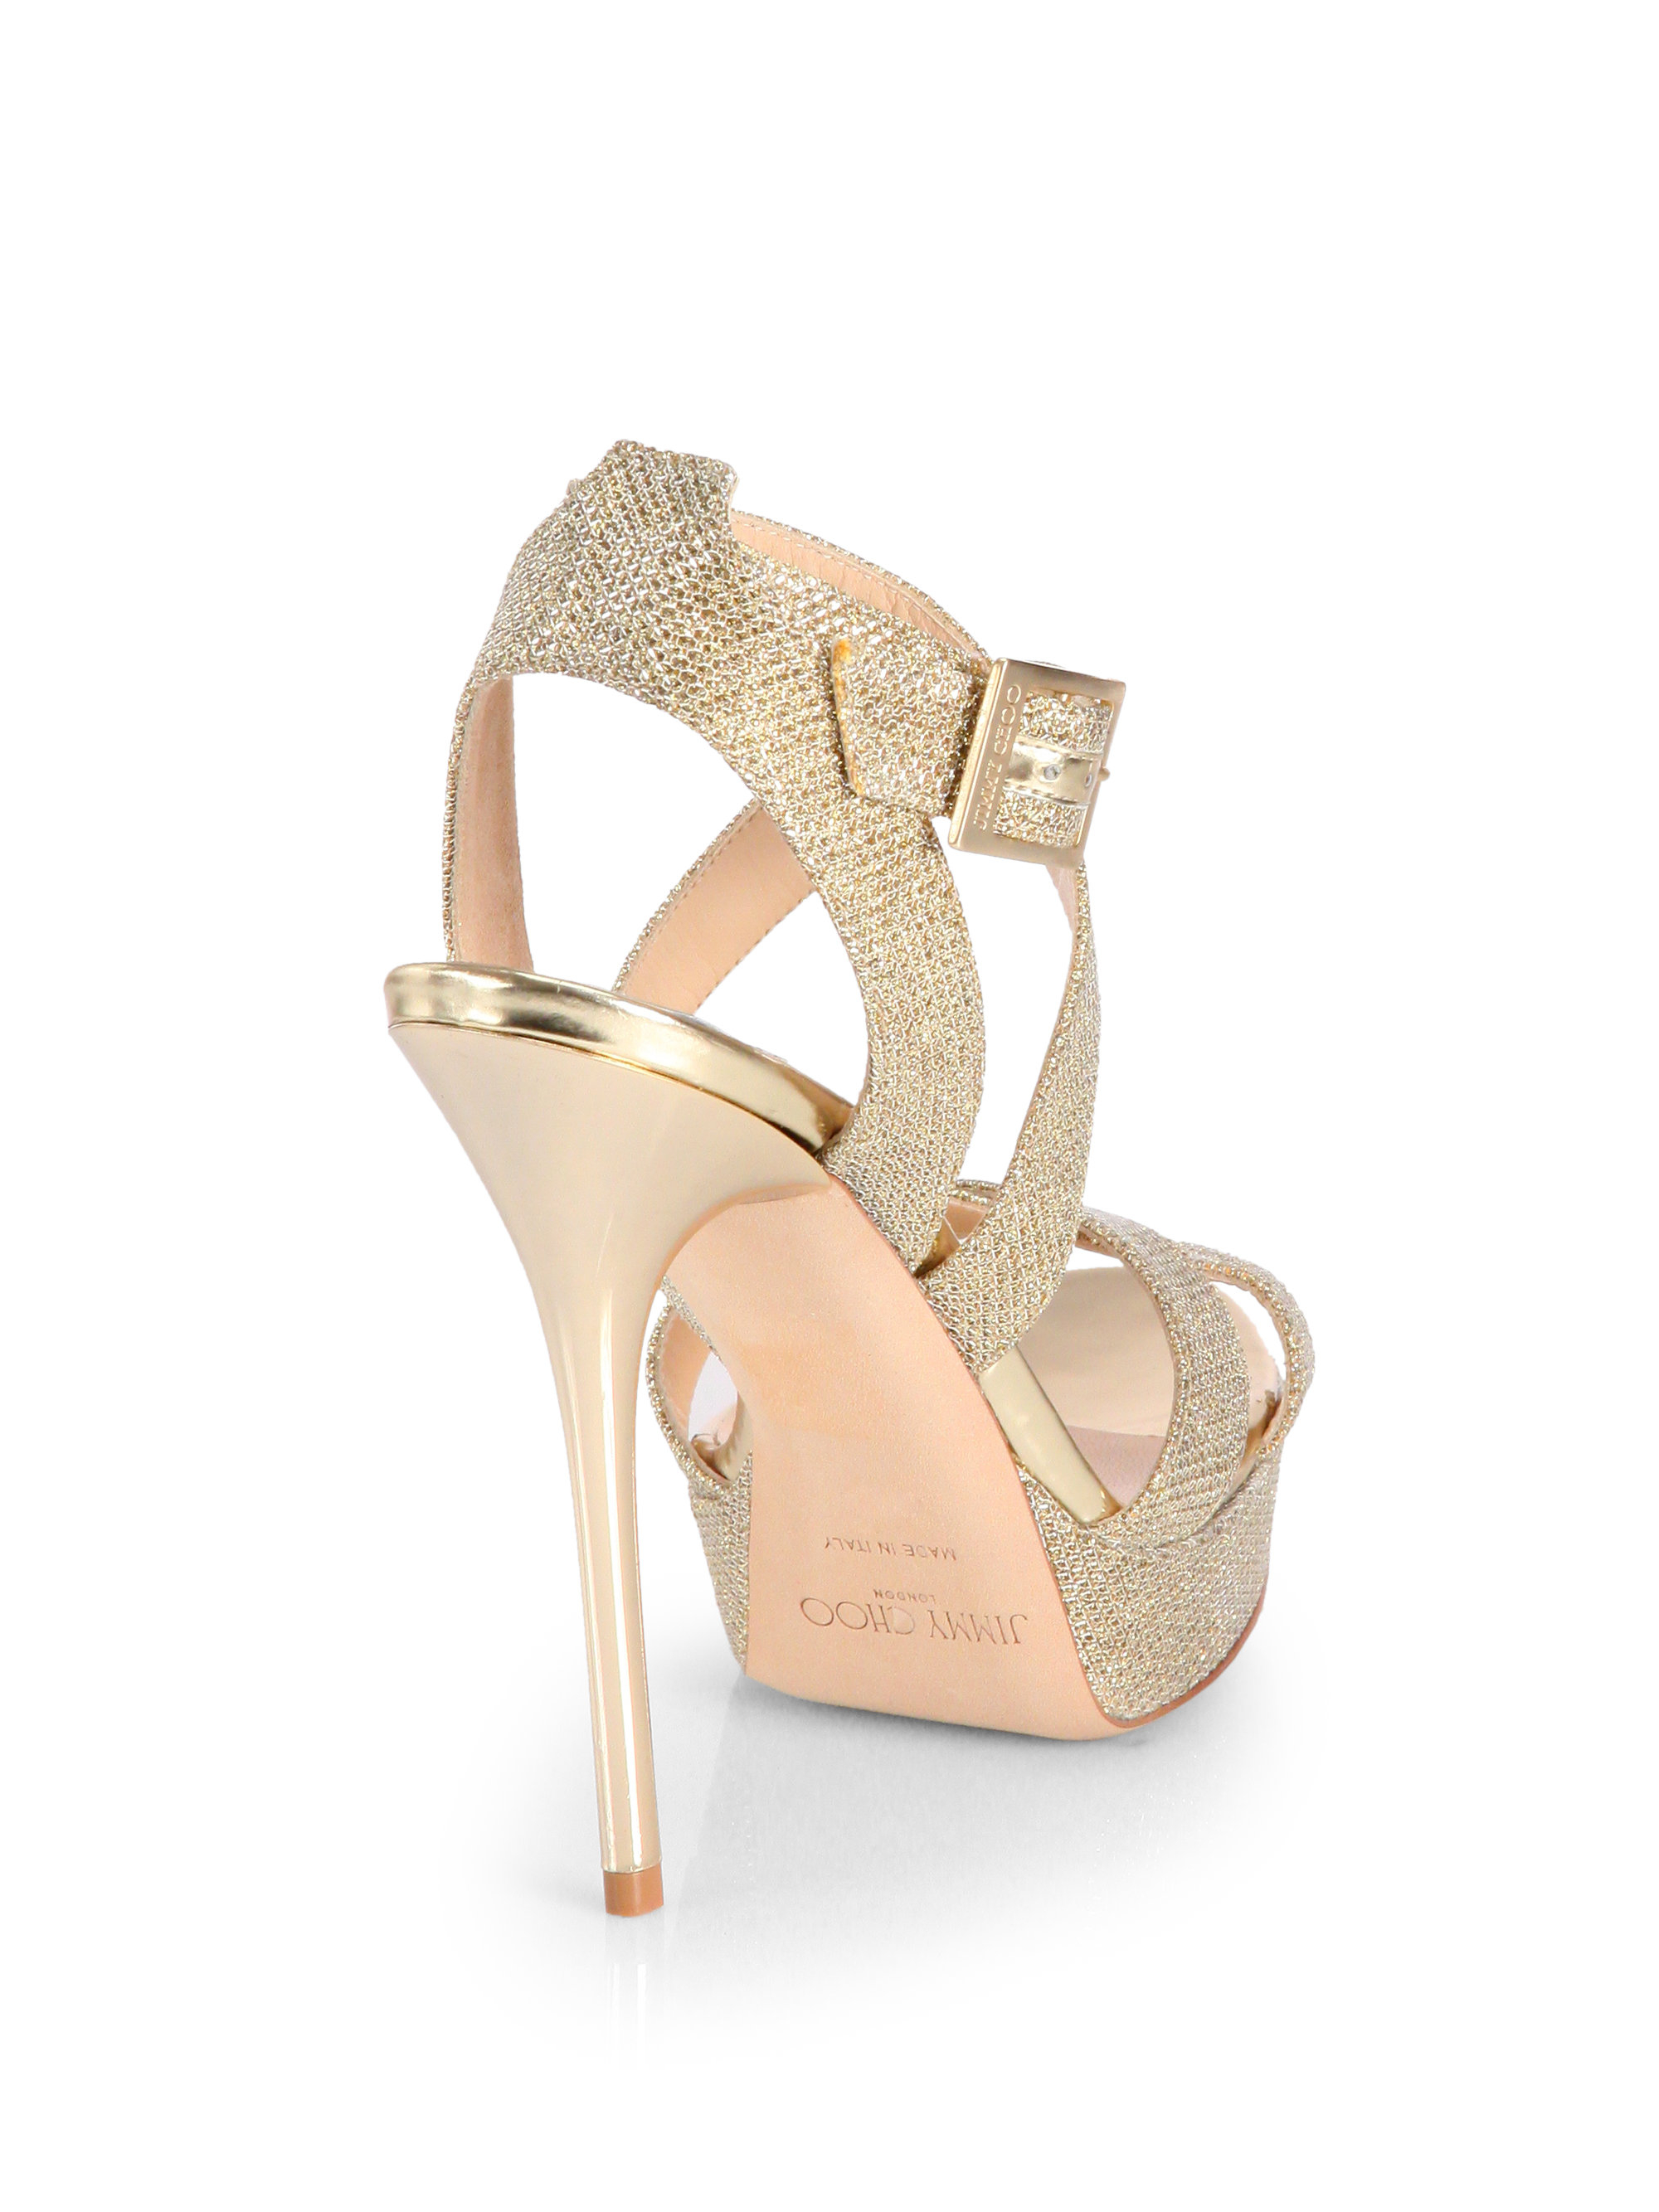 16cc93f924a Lyst - Jimmy Choo Vamp Glitter Lam Eacute  Platform Sandals in Metallic